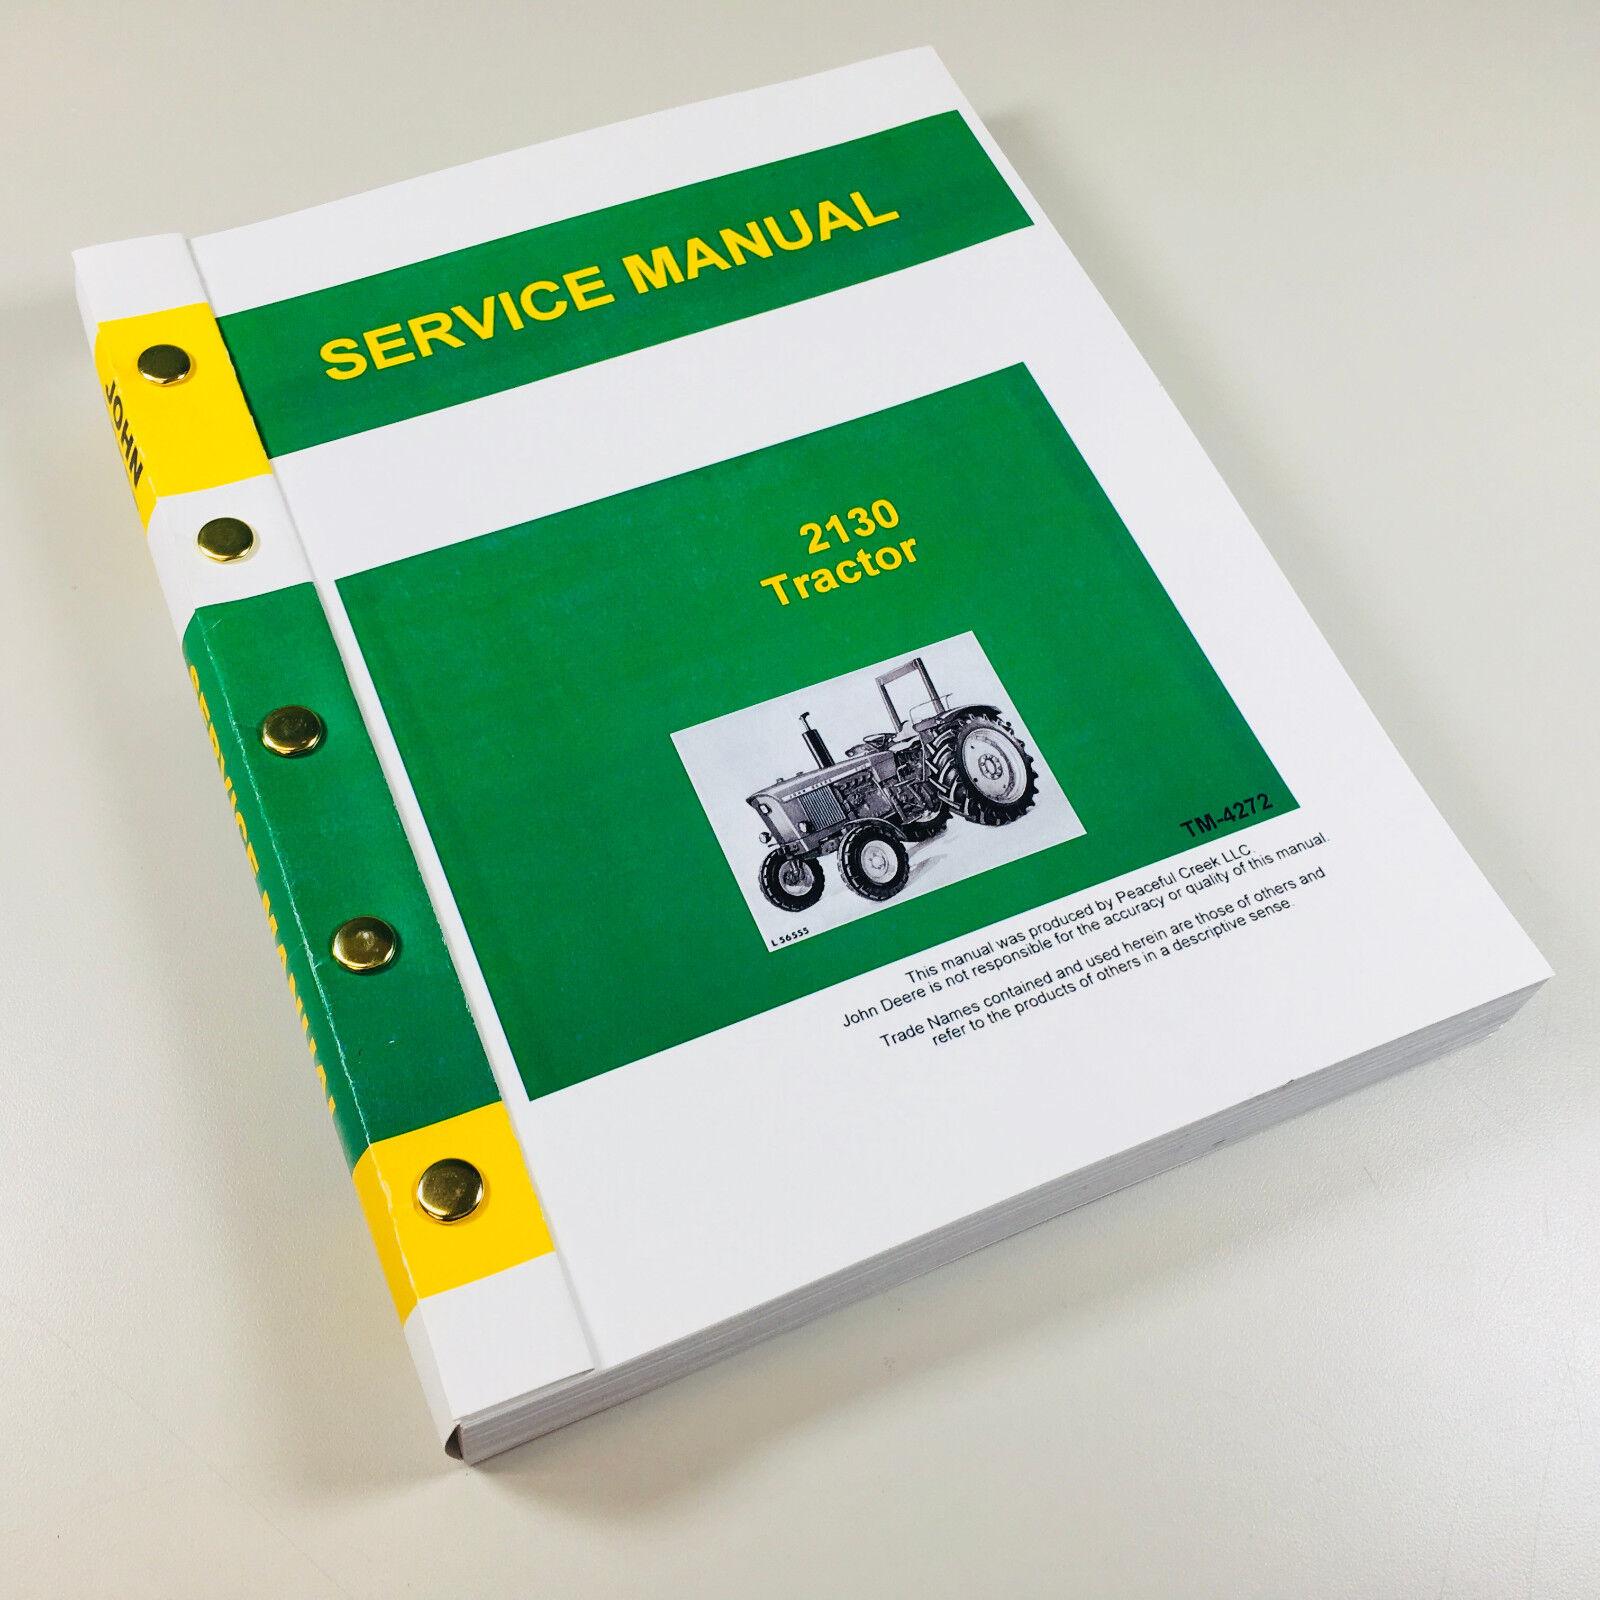 service manual for john deere 2130 tractor technical repair shop rh ebay com john deere 2130 service manual pdf John Deere 2130 Tractor Parts